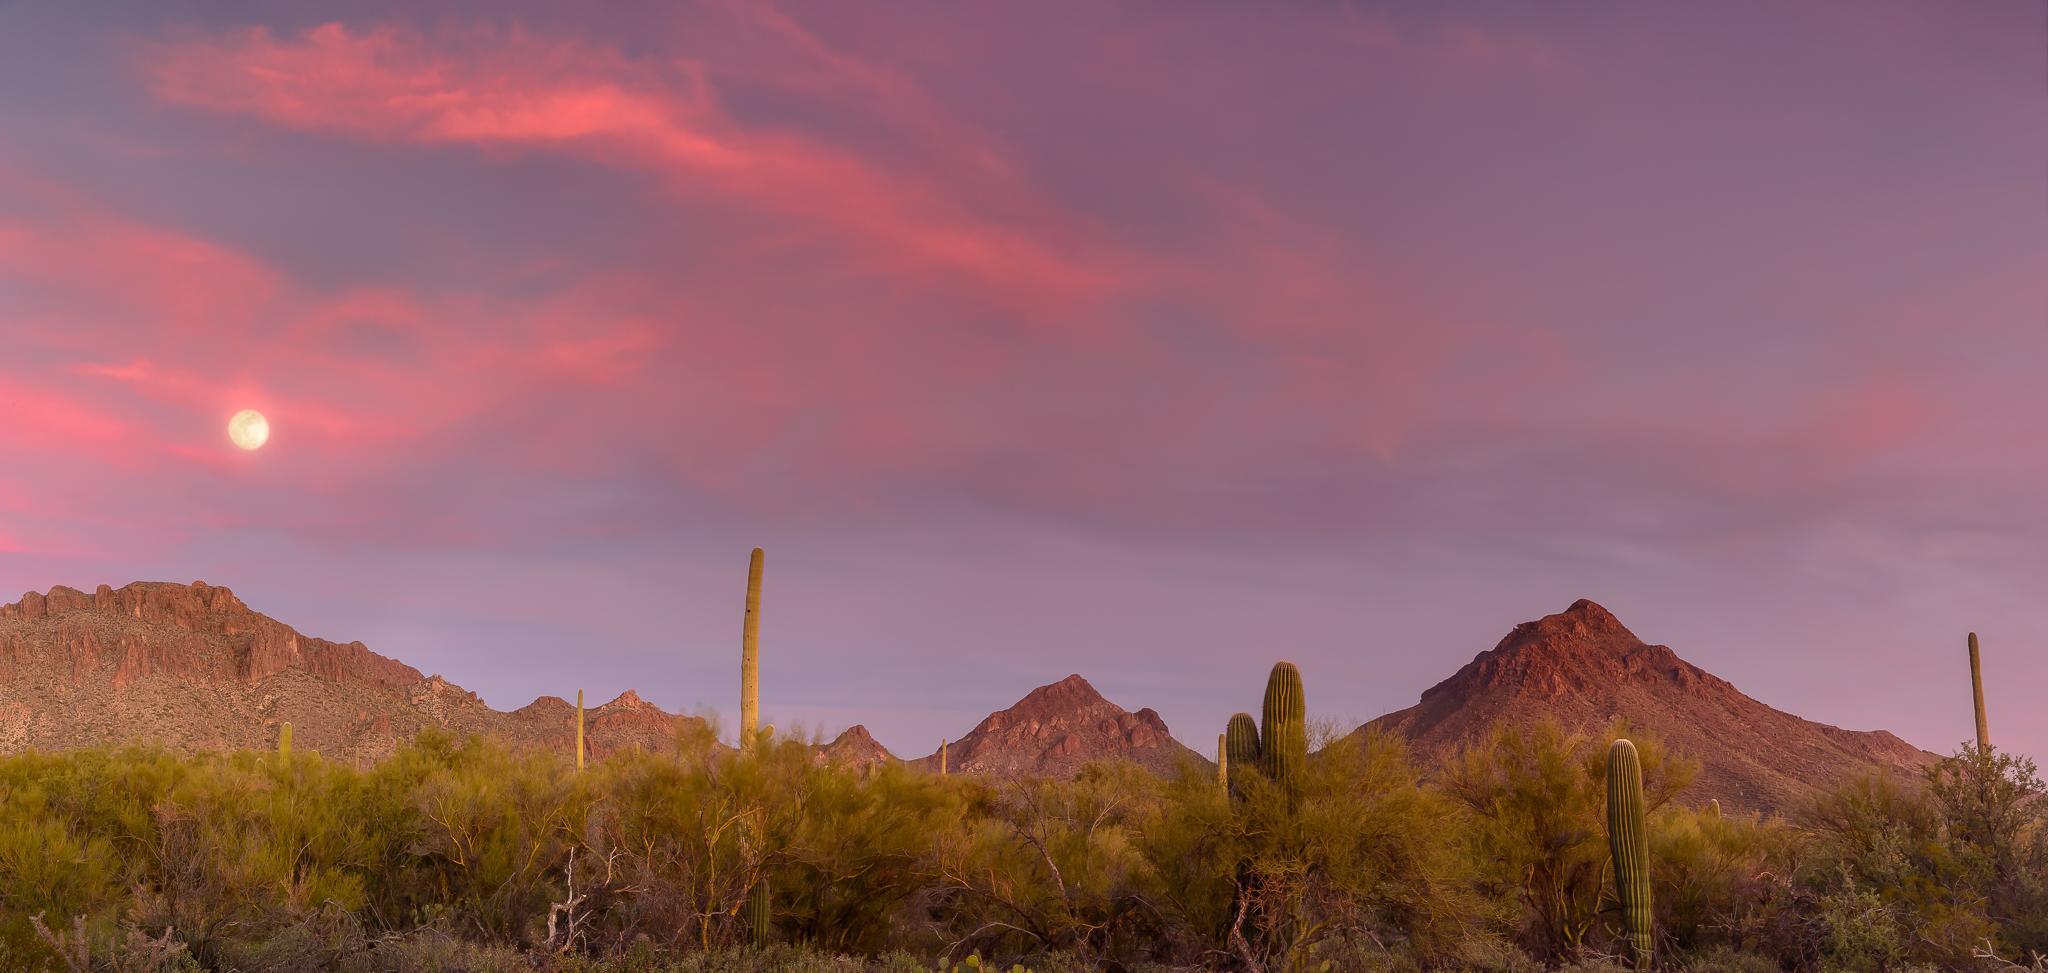 Surprise moonrise cameo. Tucson Mountain Park, AZ.